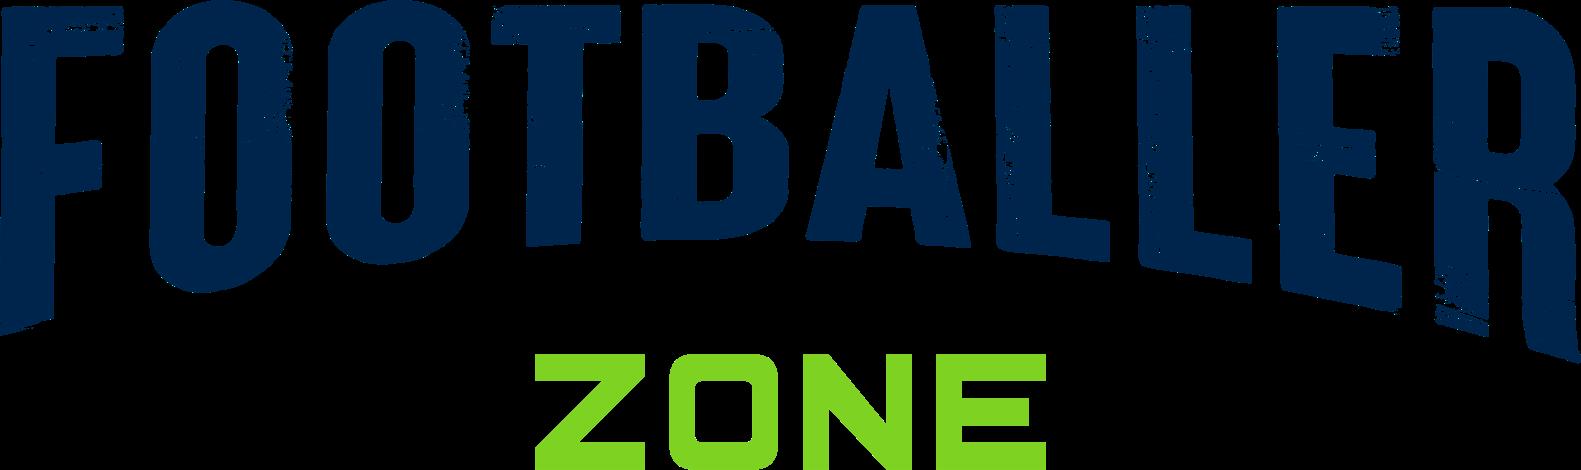 Footballer.zone logo